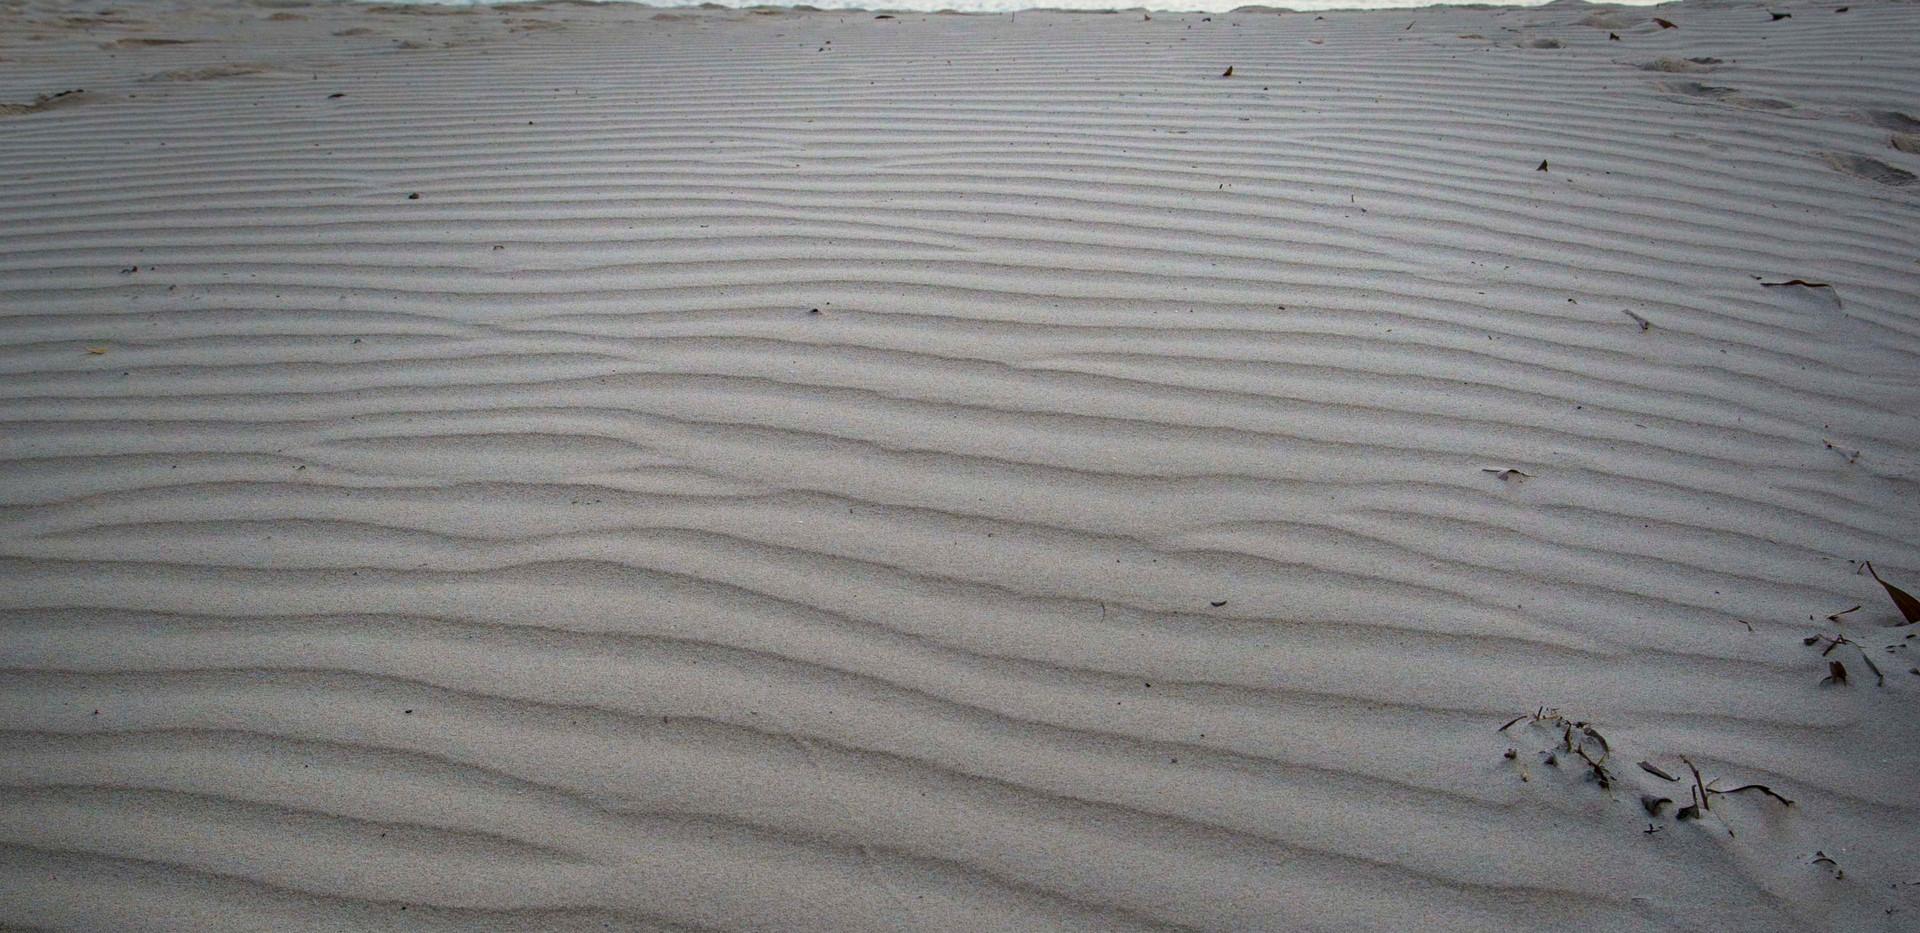 Beyond the sand wall